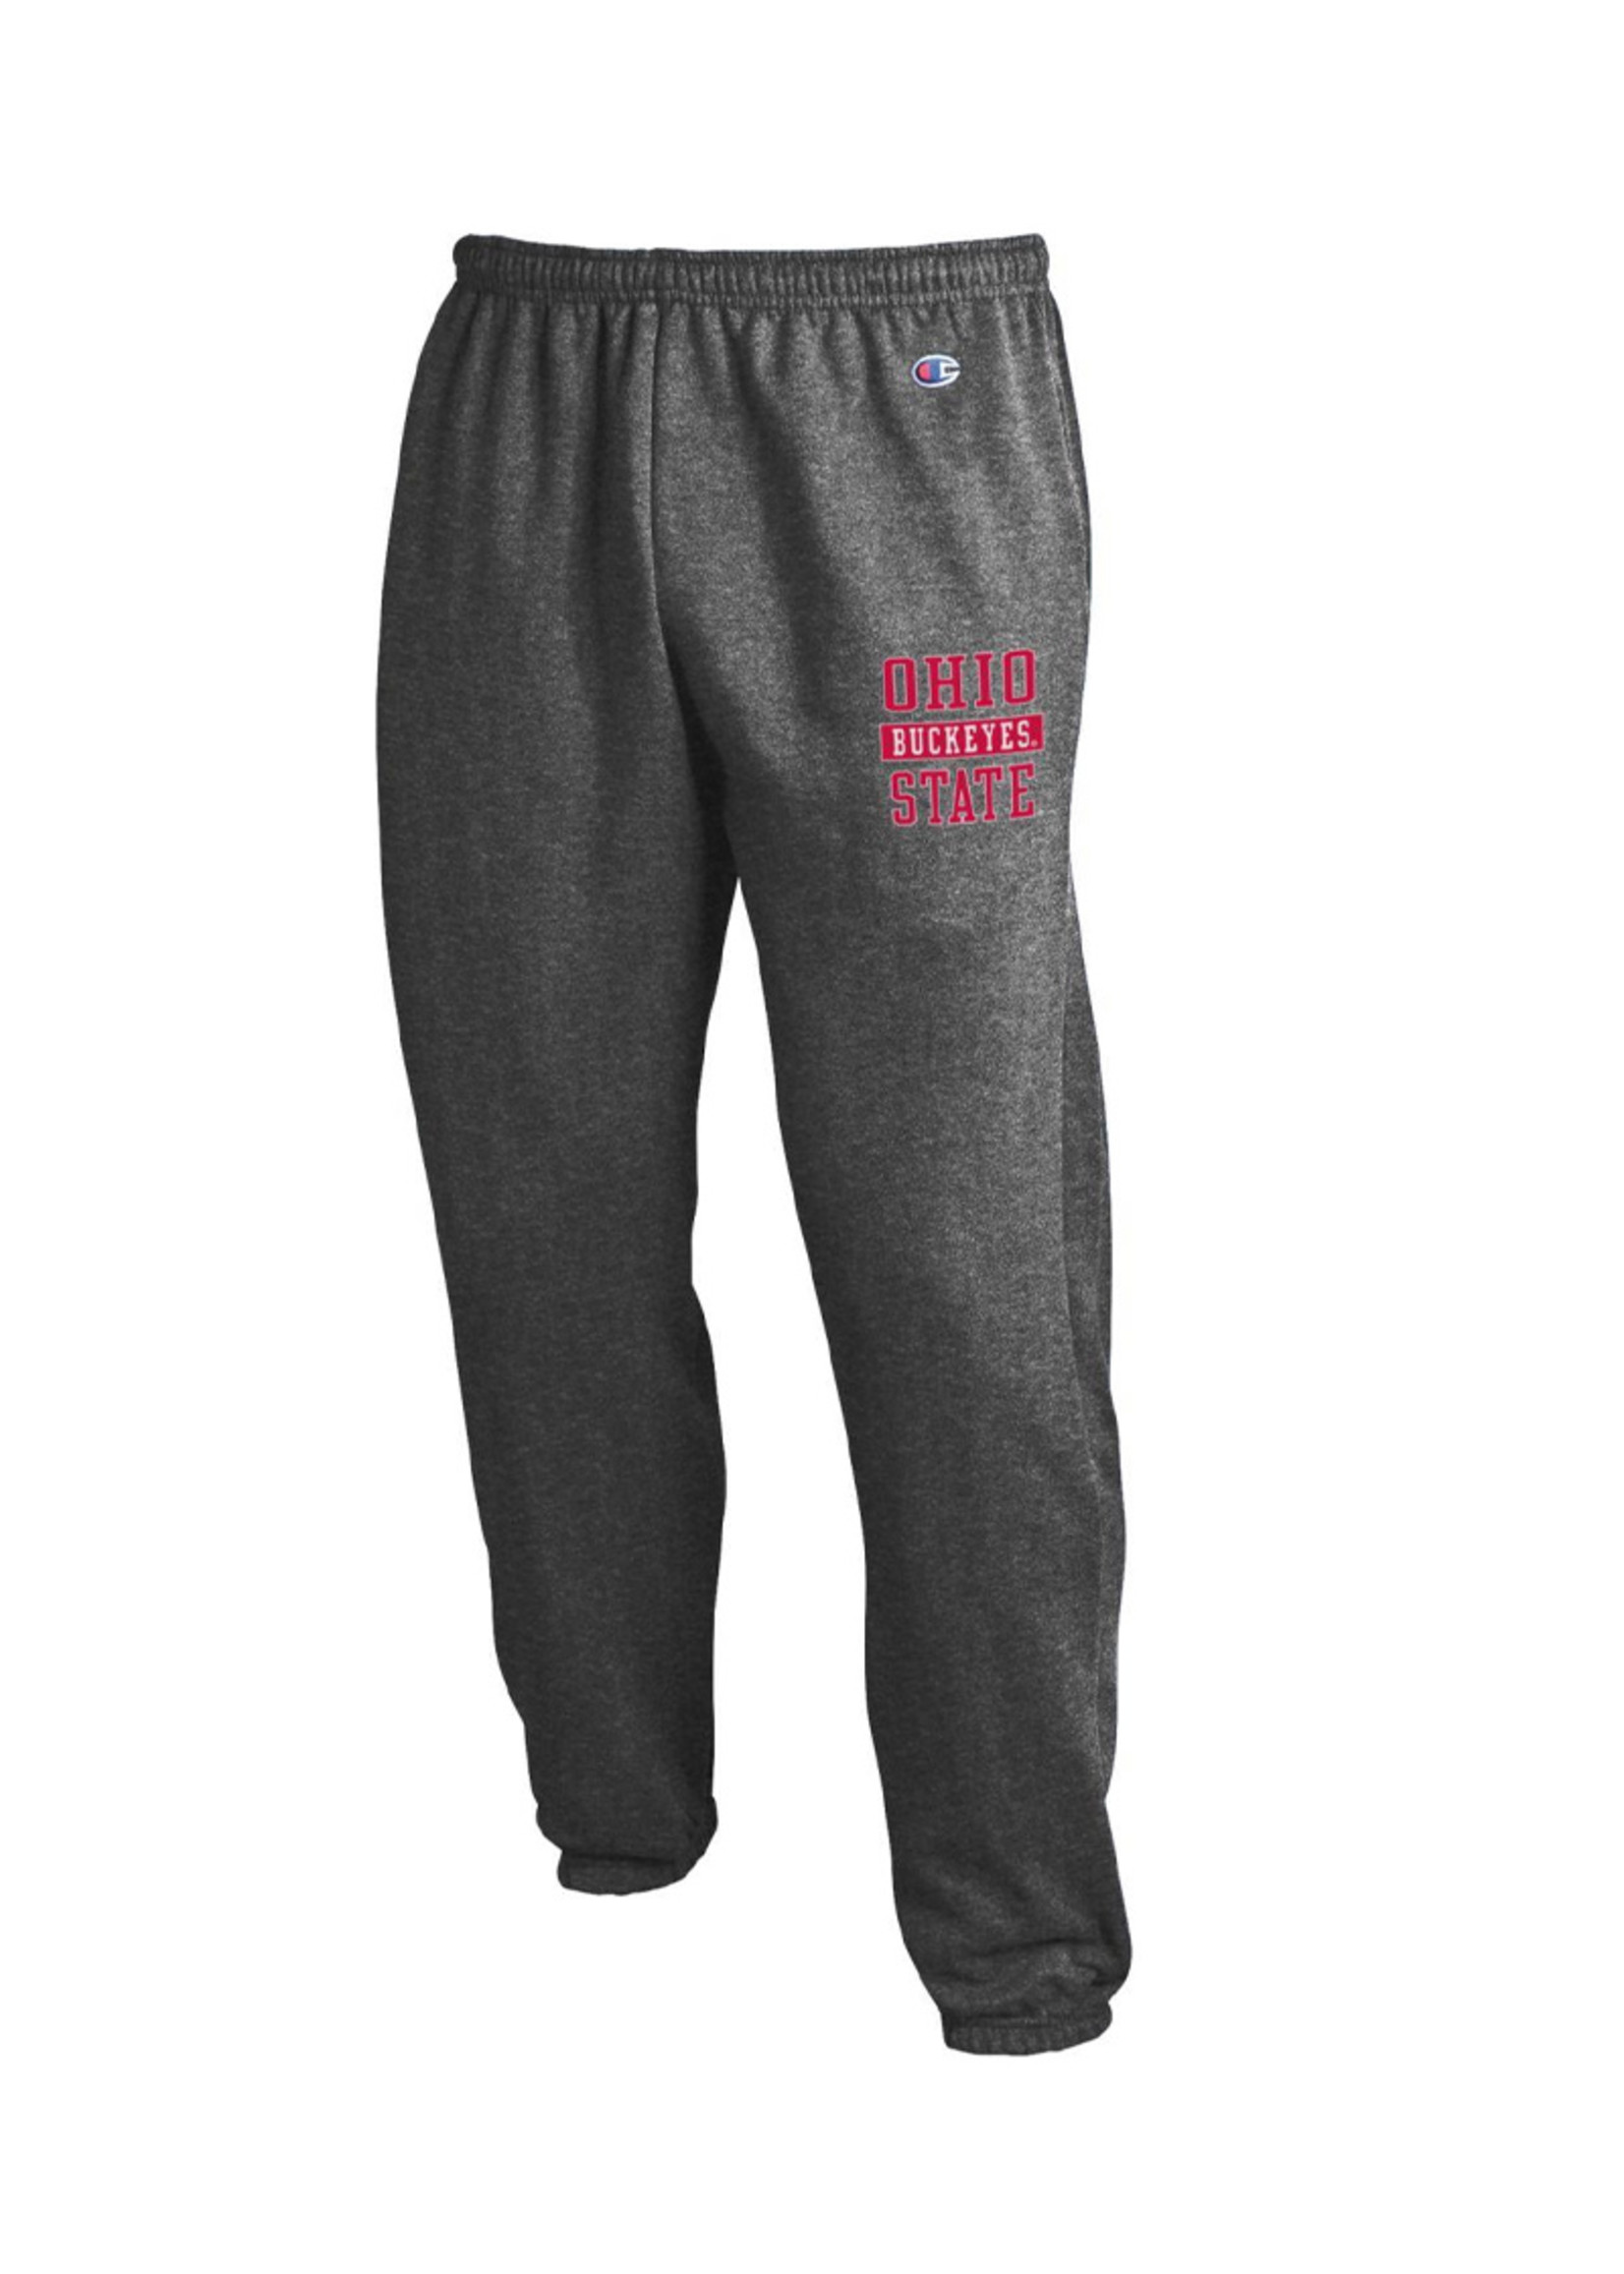 Champion Ohio State Buckeyes Men's Banded Bottom Sweatpants